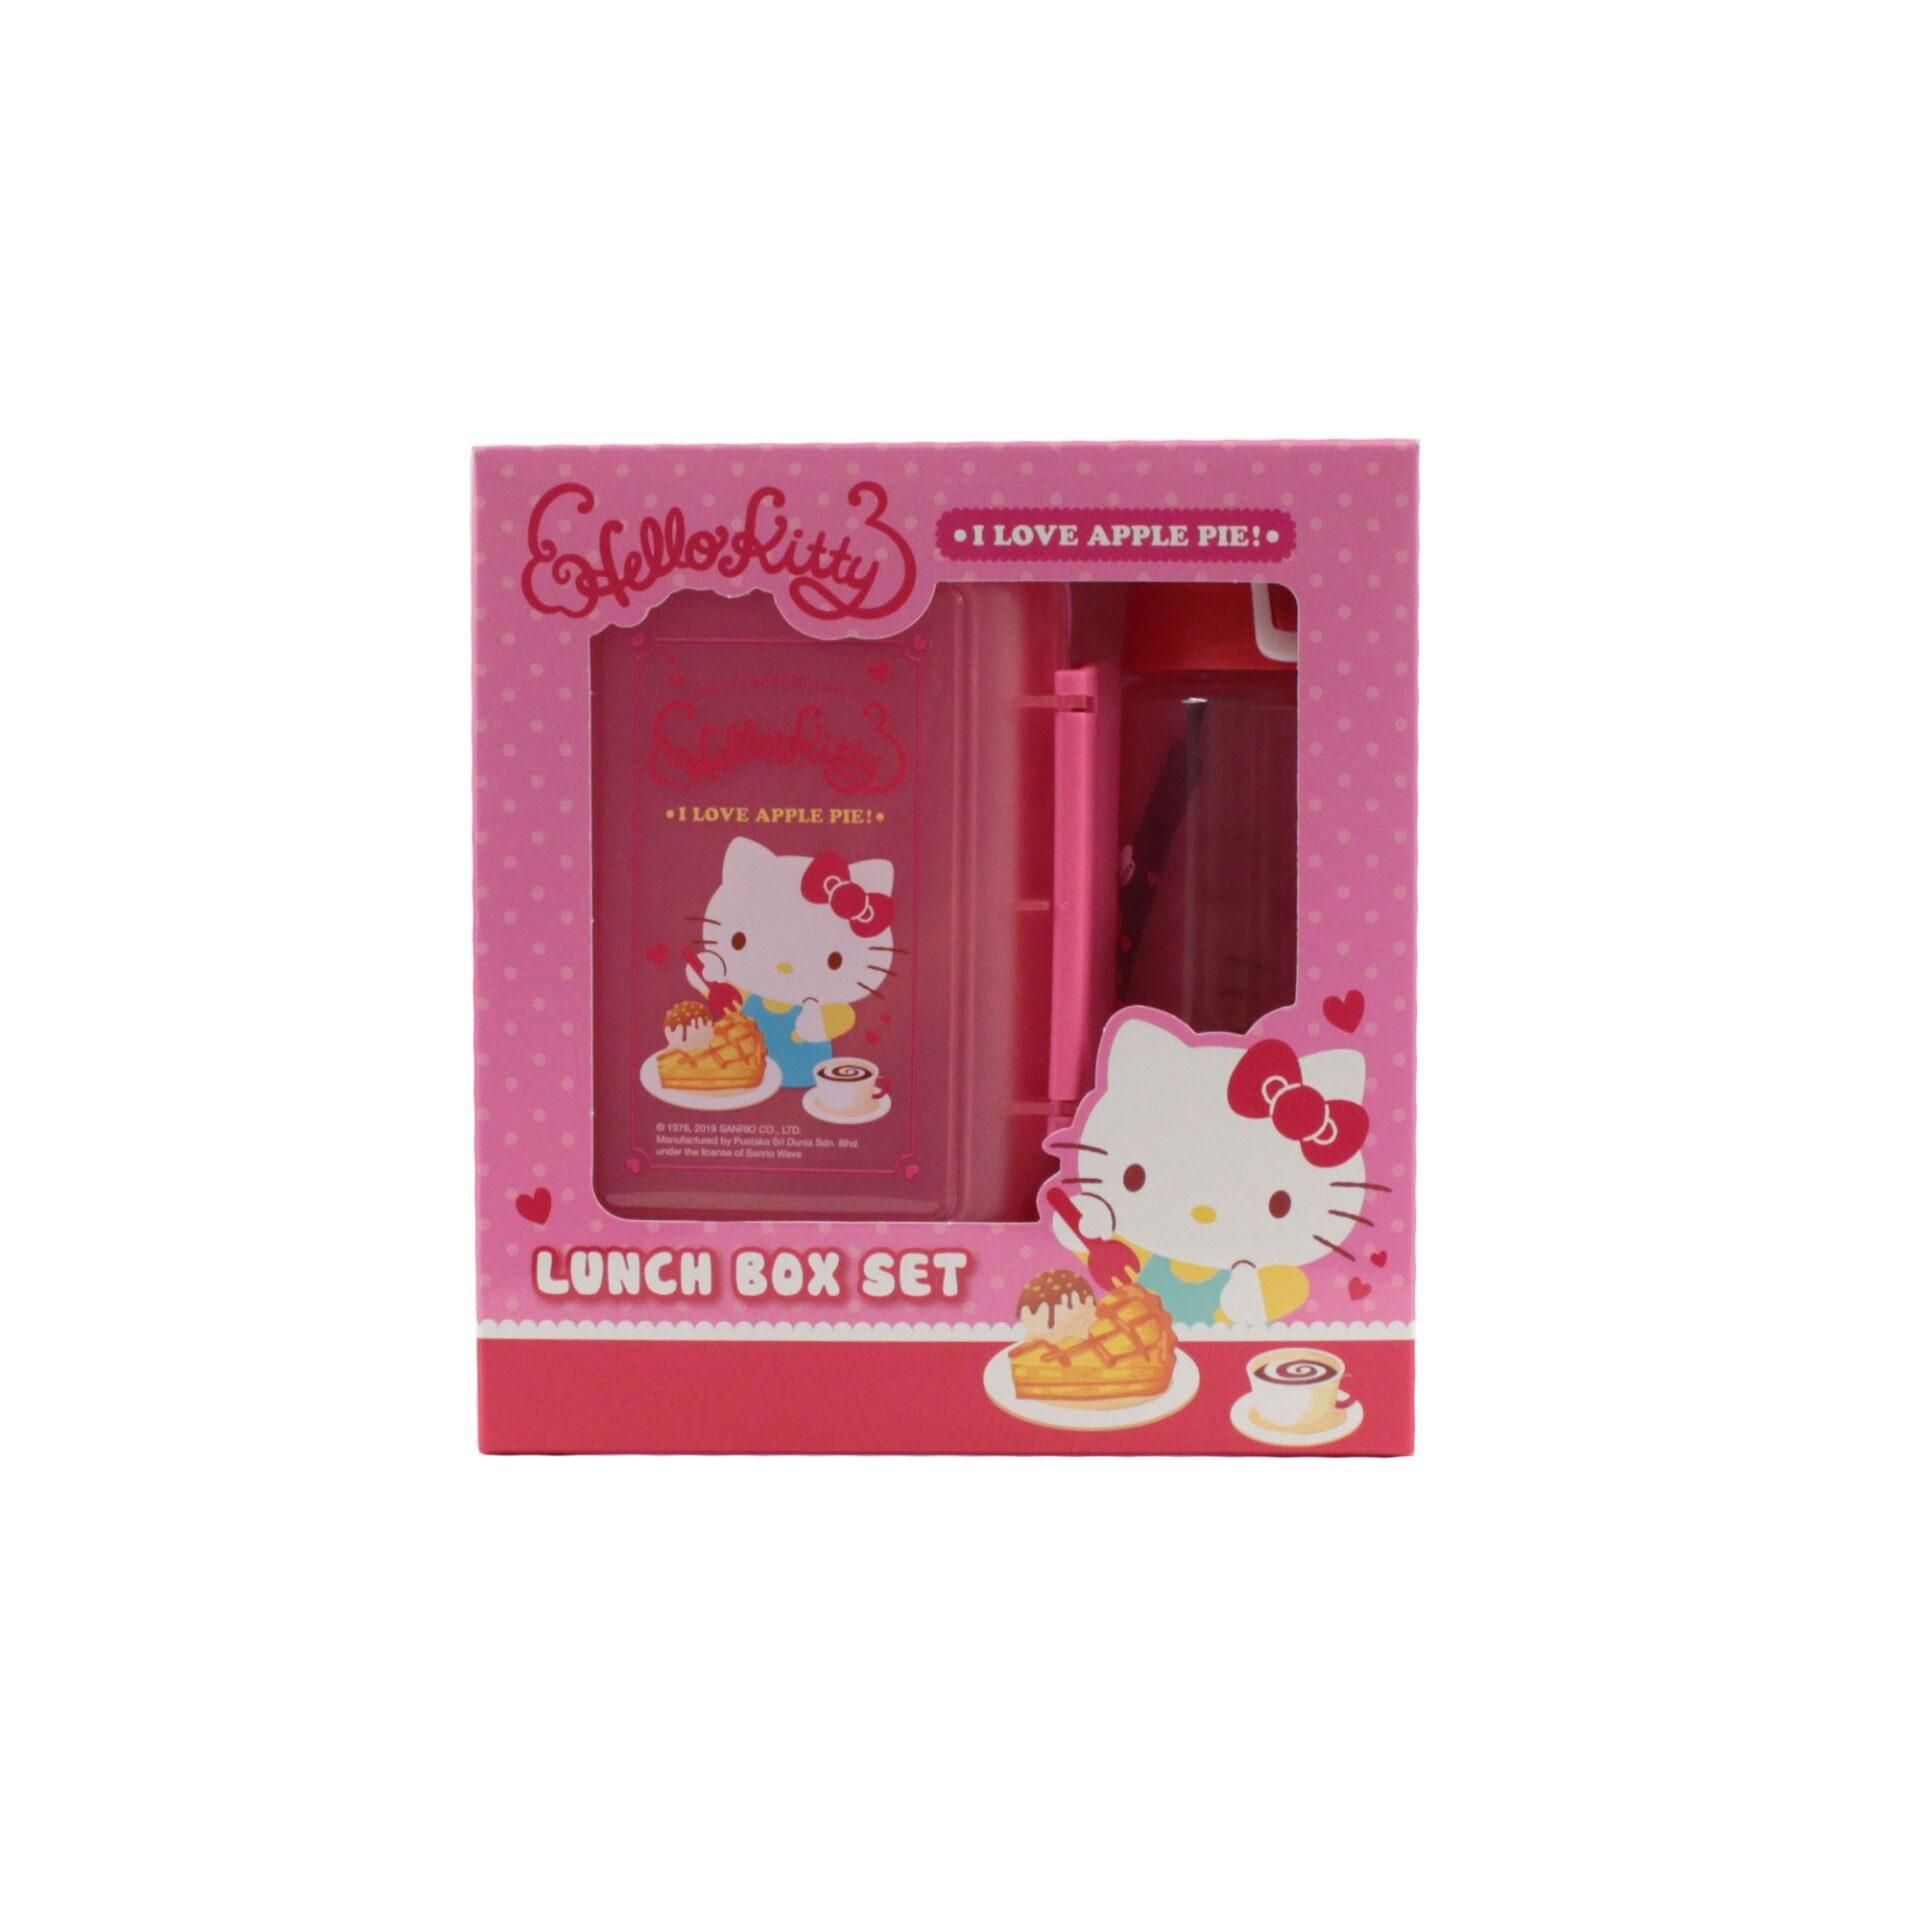 Sanrio Hello Kitty I Love Apple Pie! 3 In 1 School Children's Pink Lunch Box Set With Spoon & Drinking Tritan Bottle 500ml With Short Handle (BPA Free)